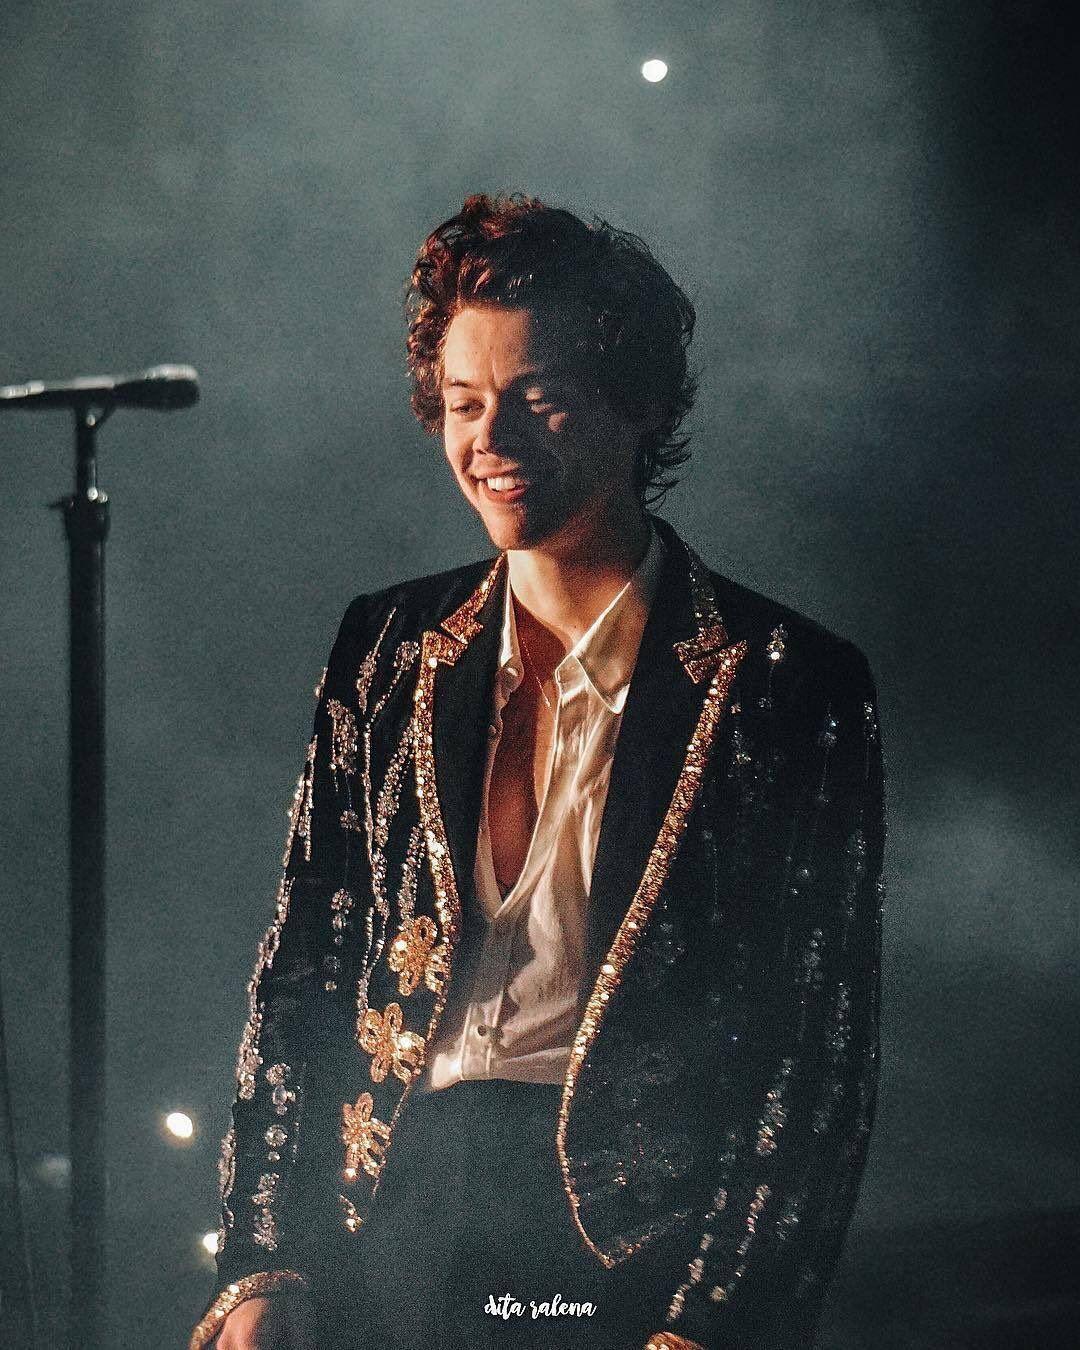 Best Harry Pics On Twitter Harry Styles Photos Harry Styles Pictures Harry Styles